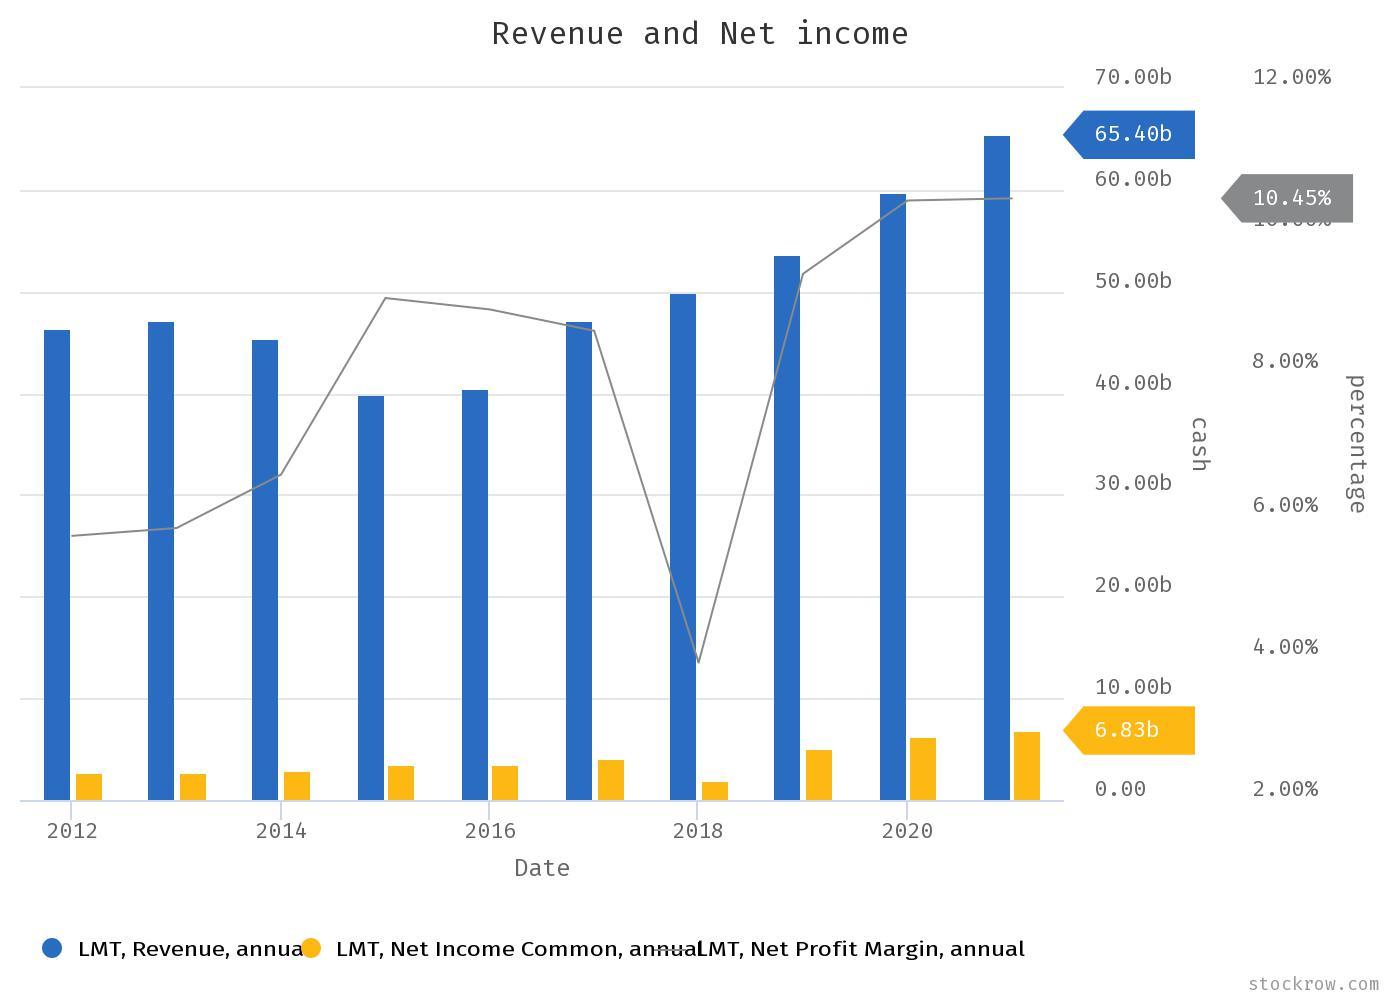 Lockheed Martin Stock Analysis, Revenue and Net Income